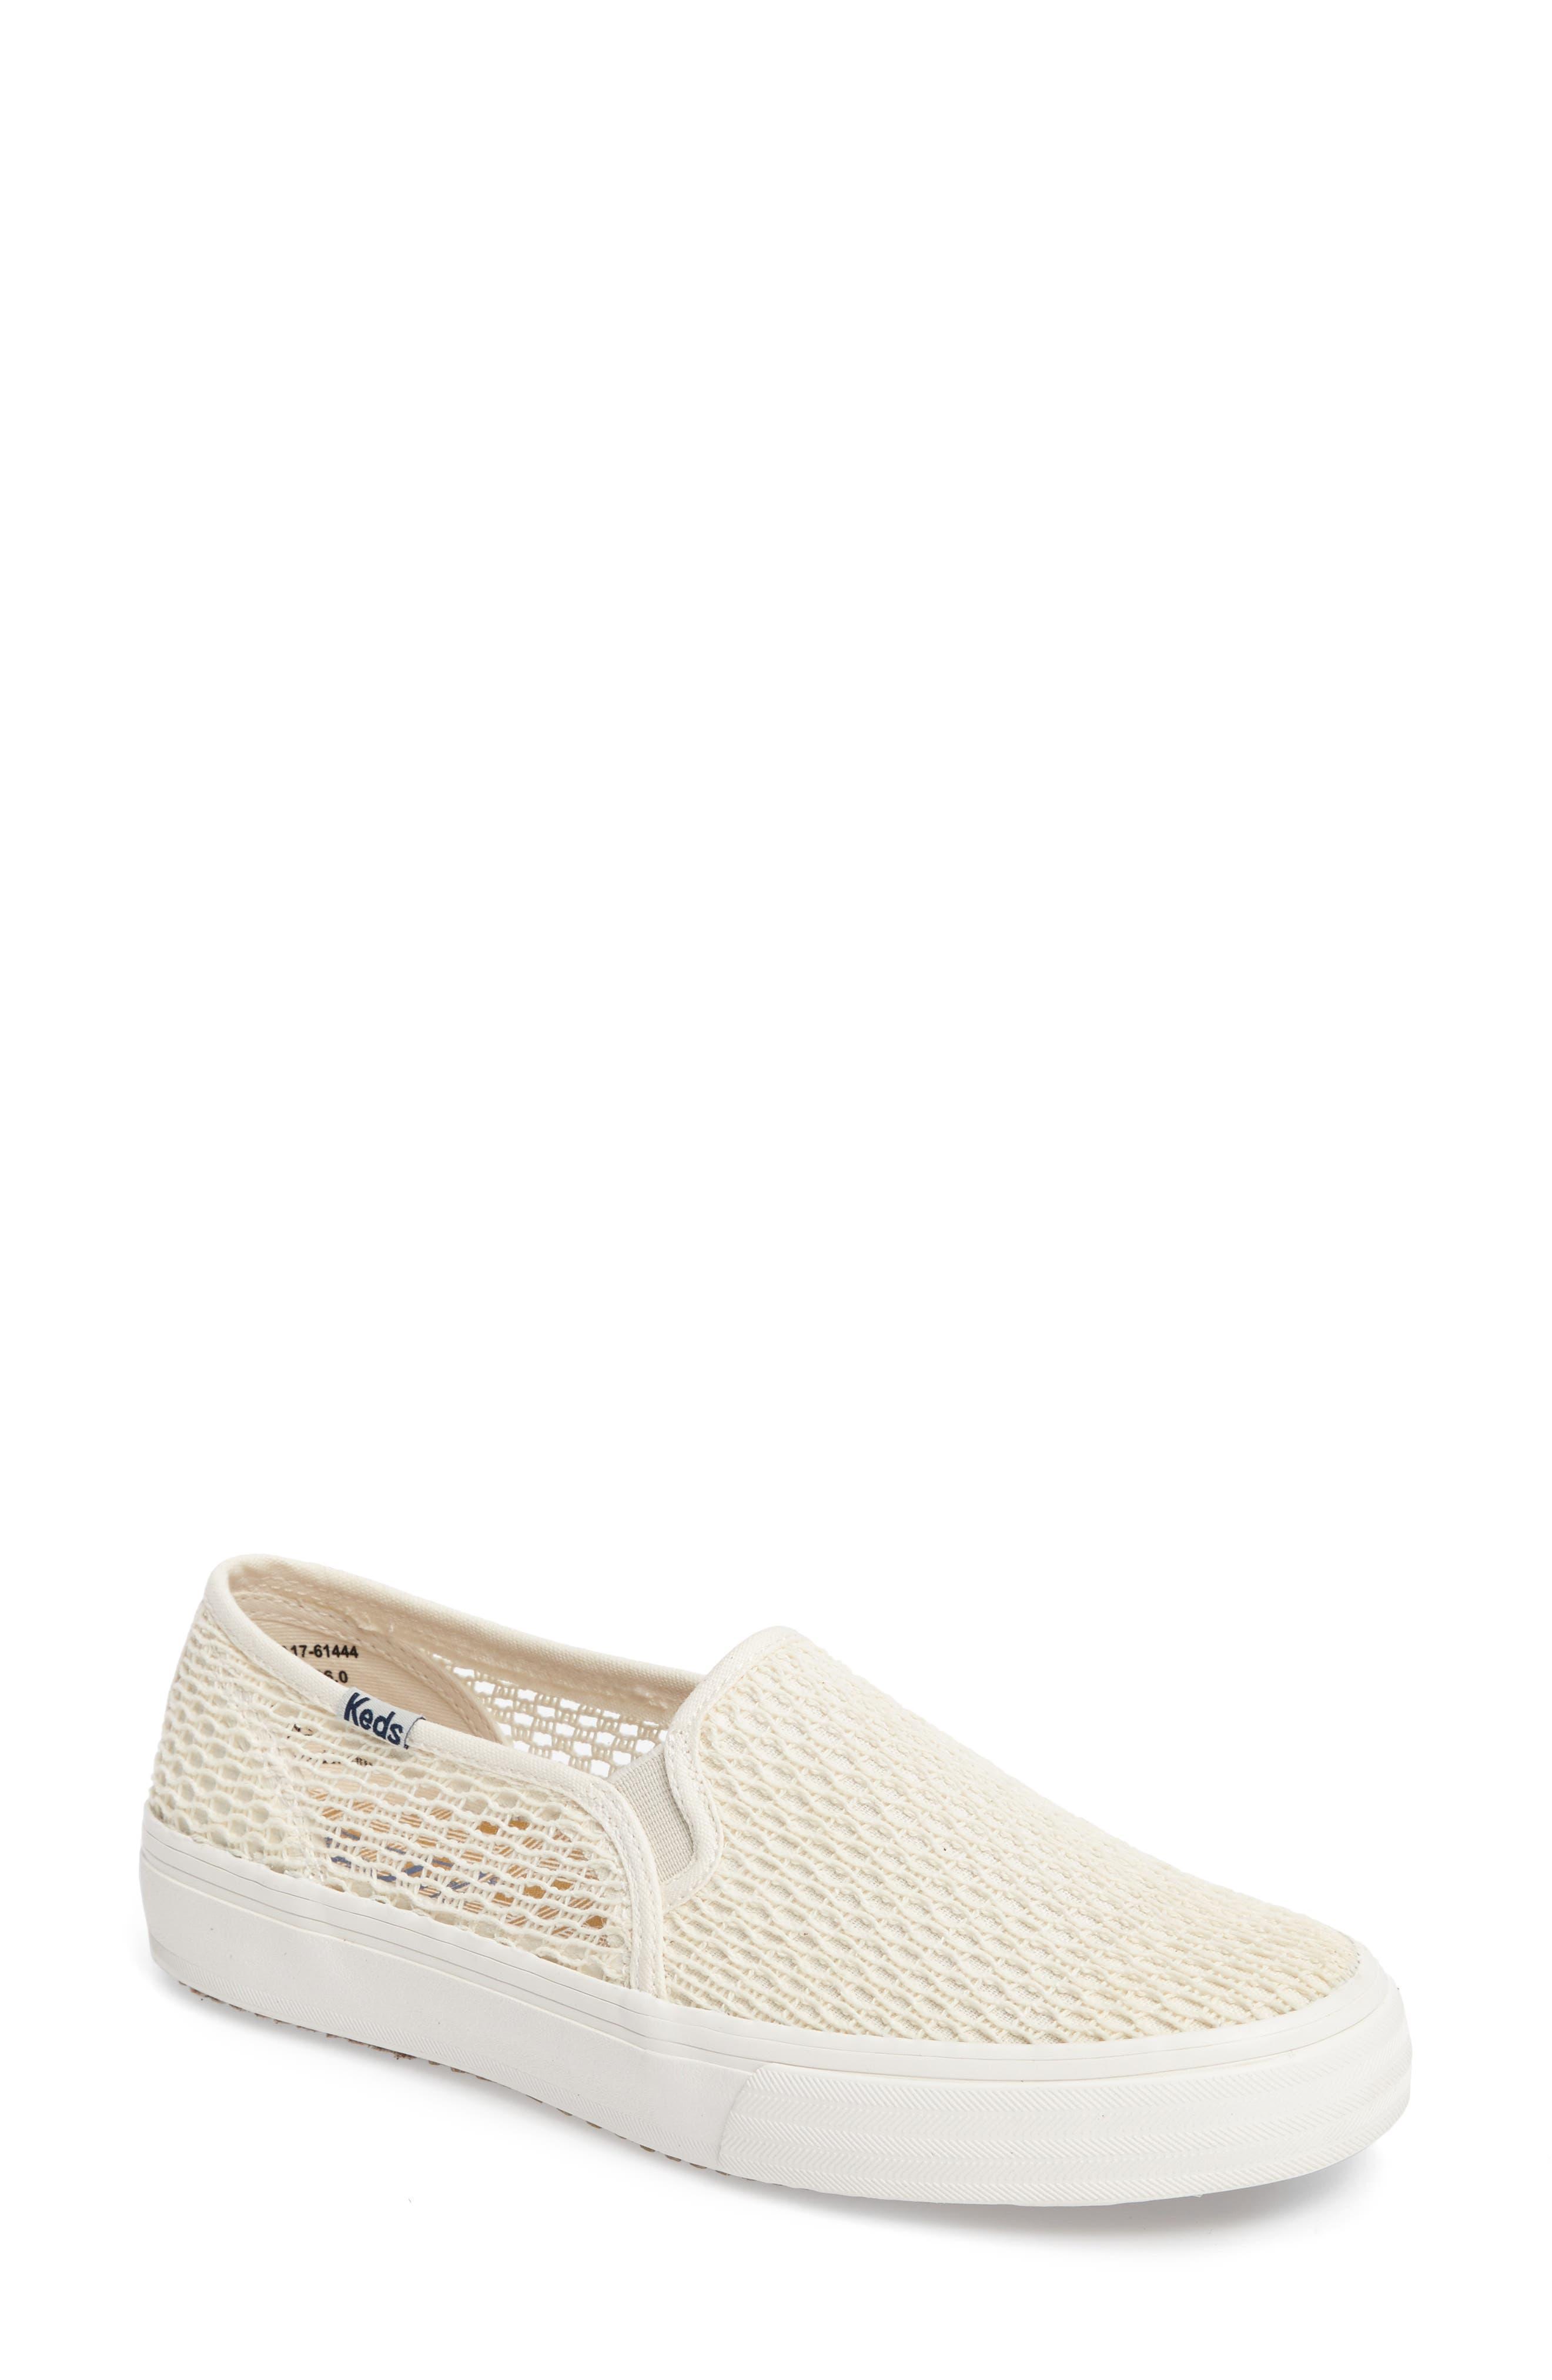 Double Decker Crochet Slip-On Sneaker,                         Main,                         color, Cream